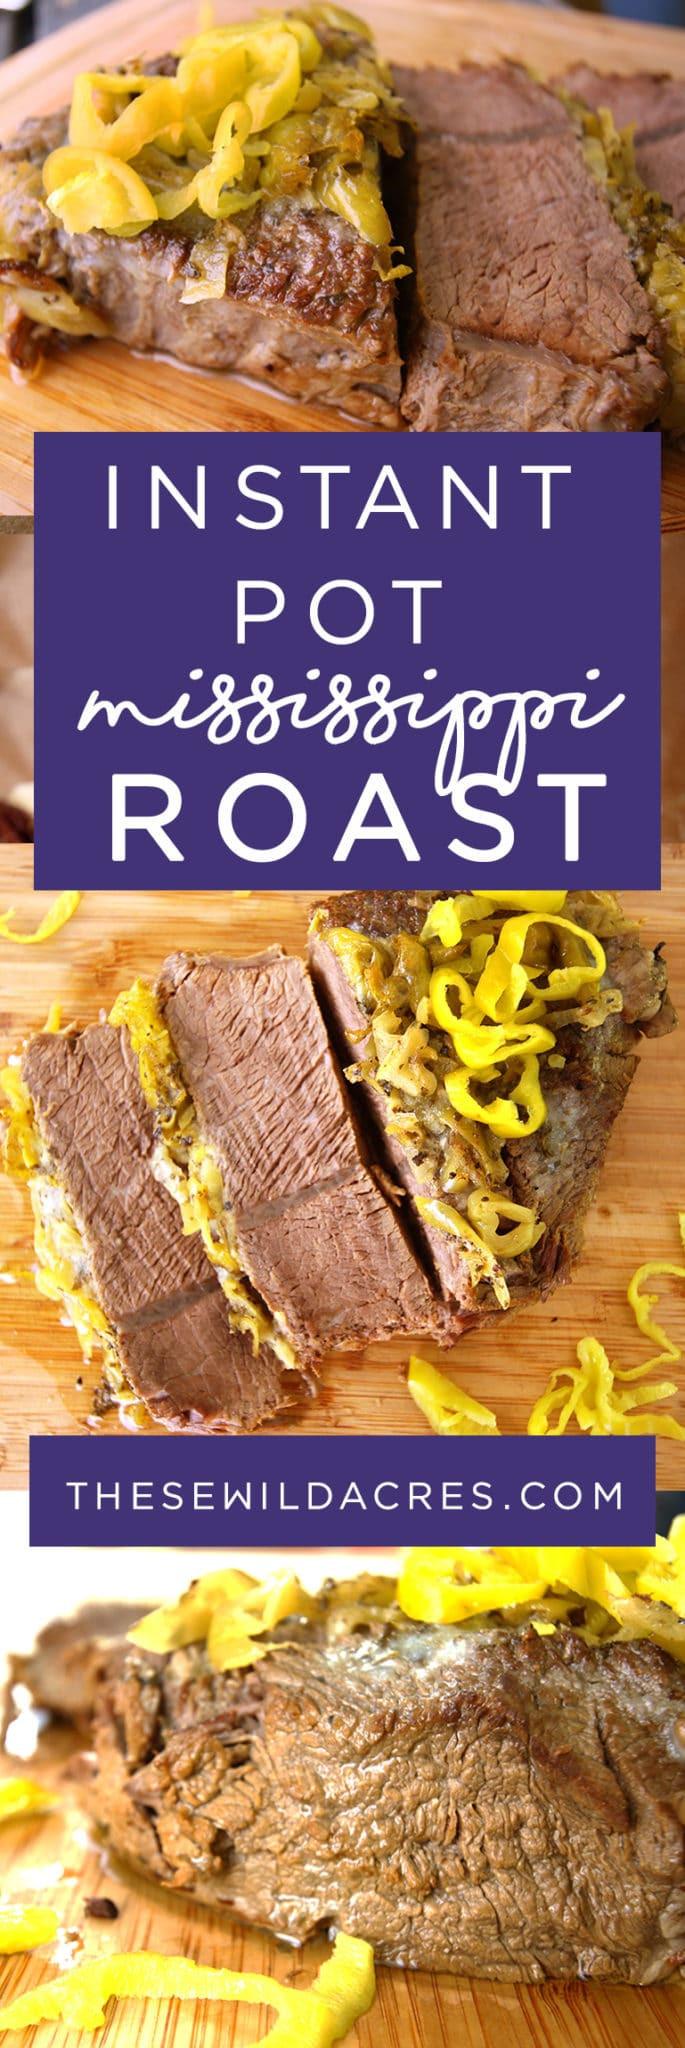 Mississippi Pot Roast Instant Pot Keto  Instant Pot Mississippi Pot Roast Recipe Keto Paleo